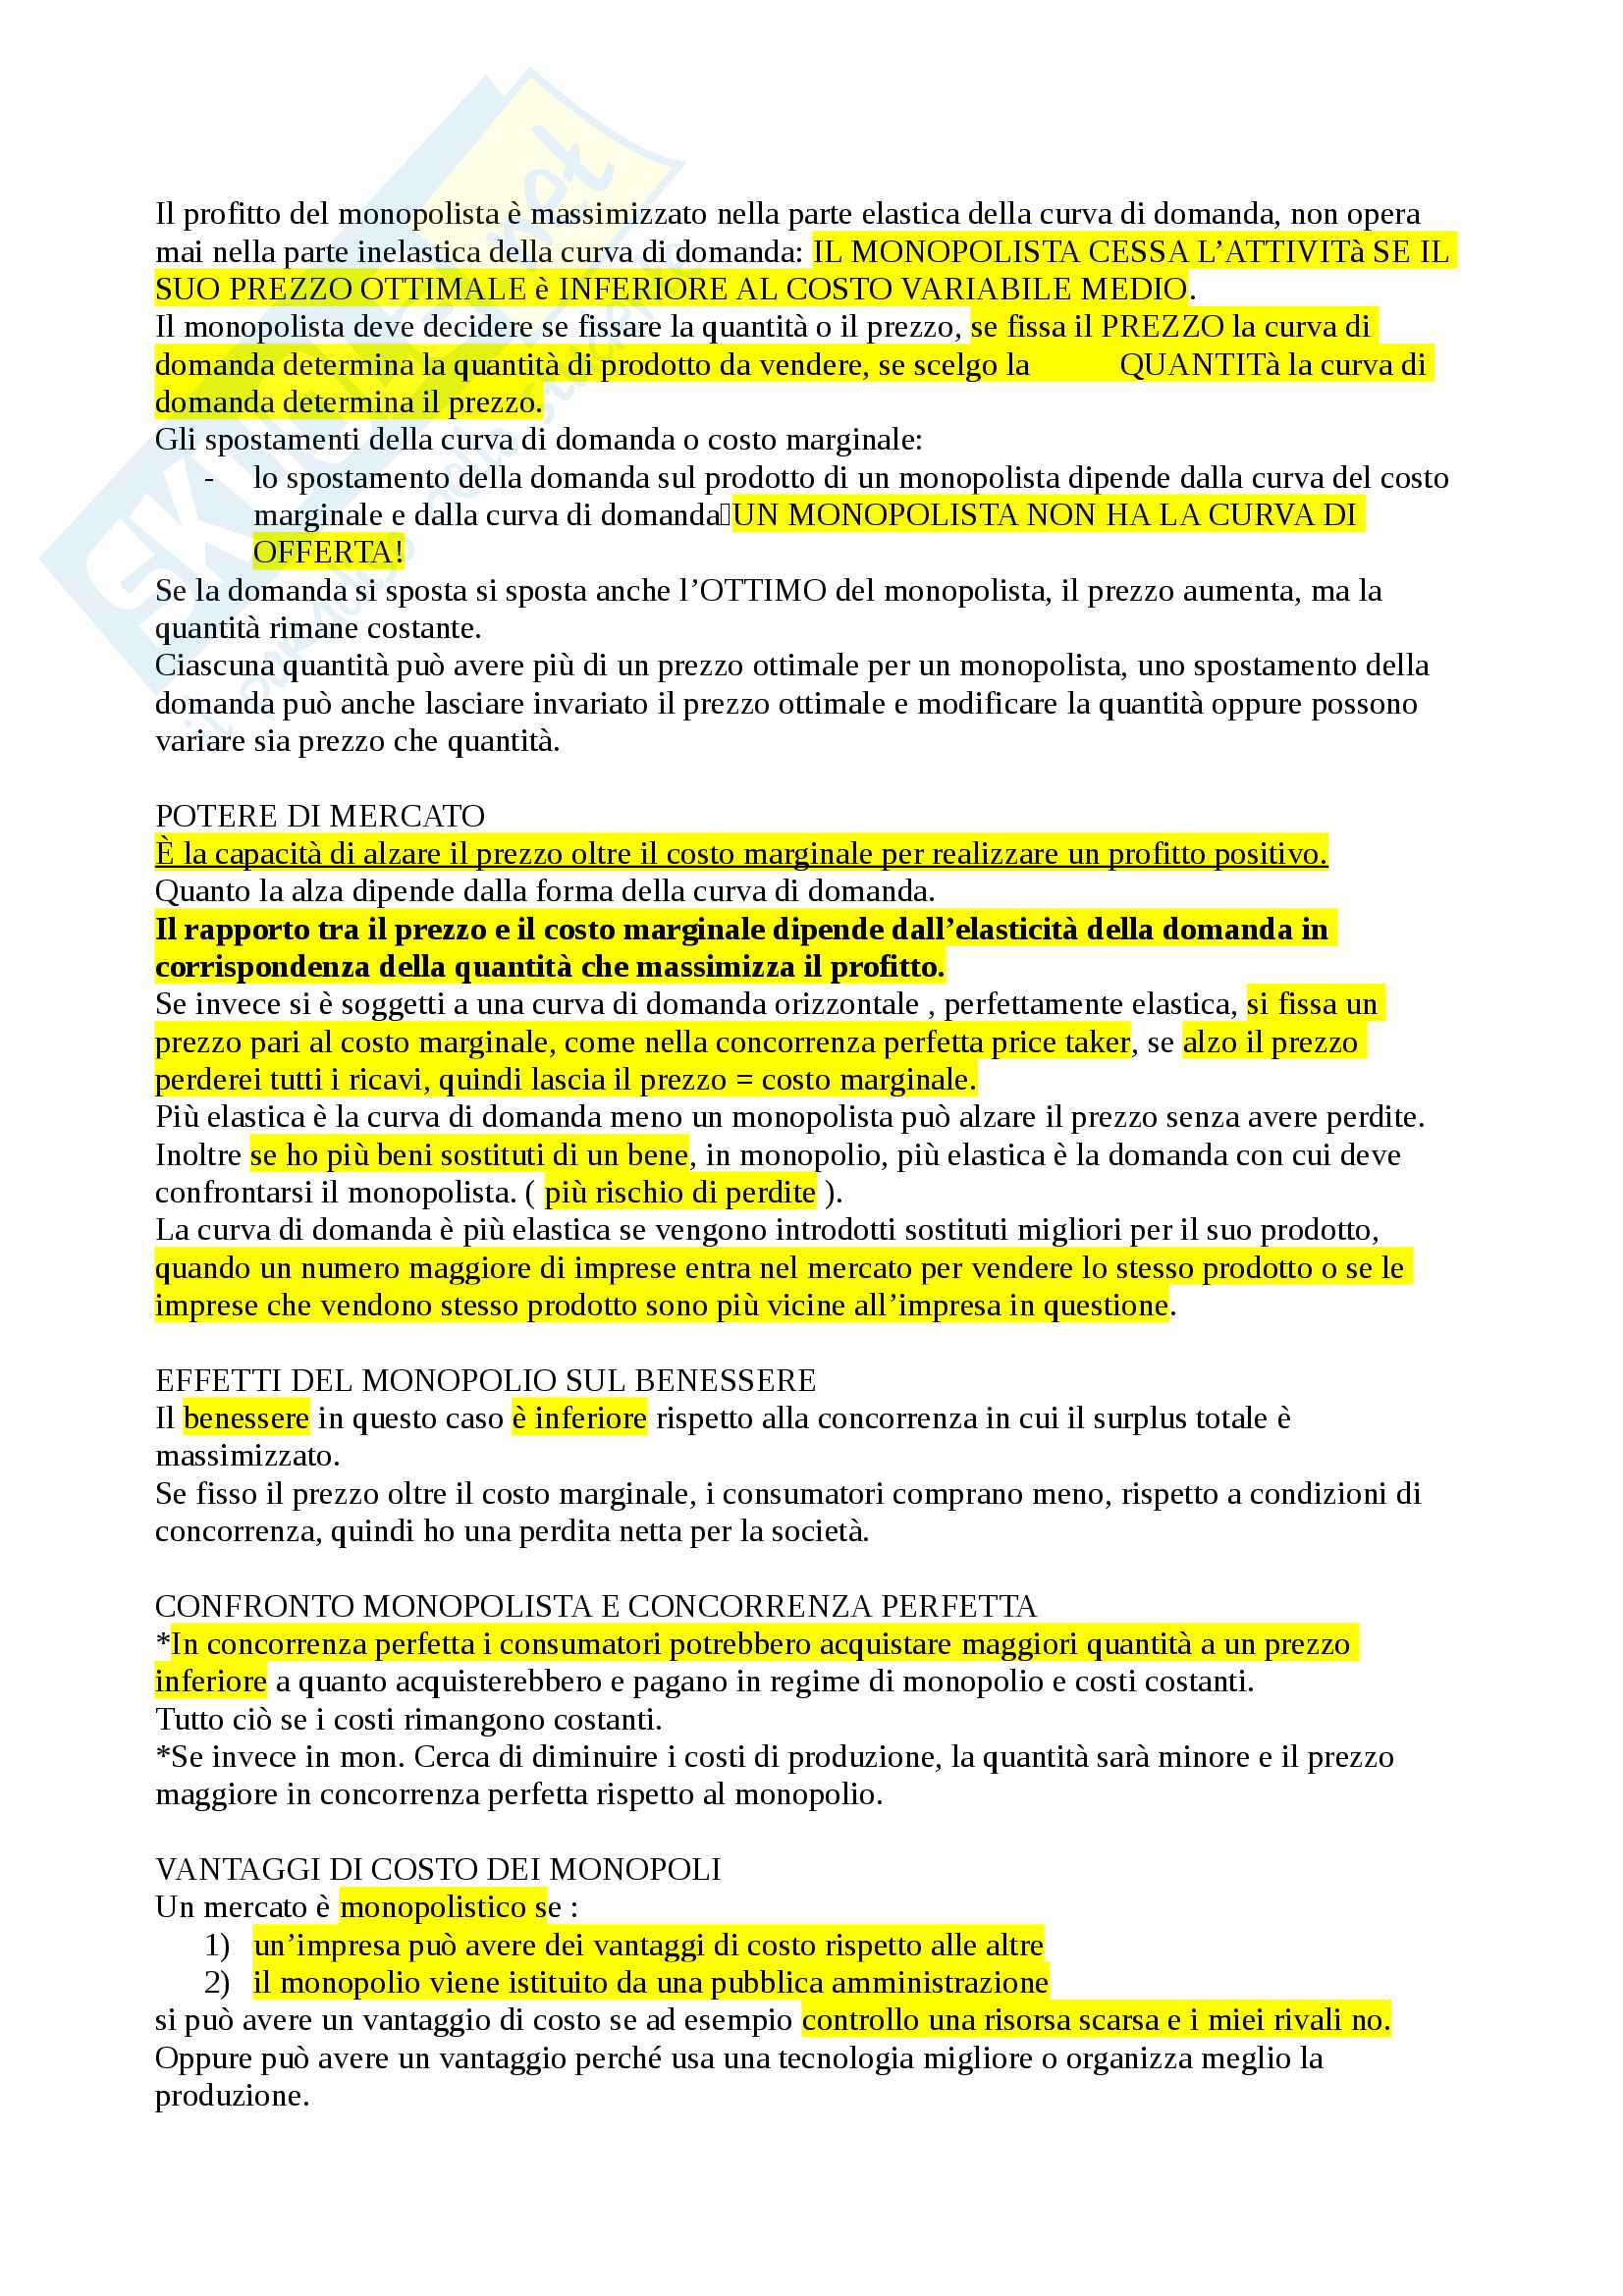 Micro post parziale ( completamento) Pag. 2